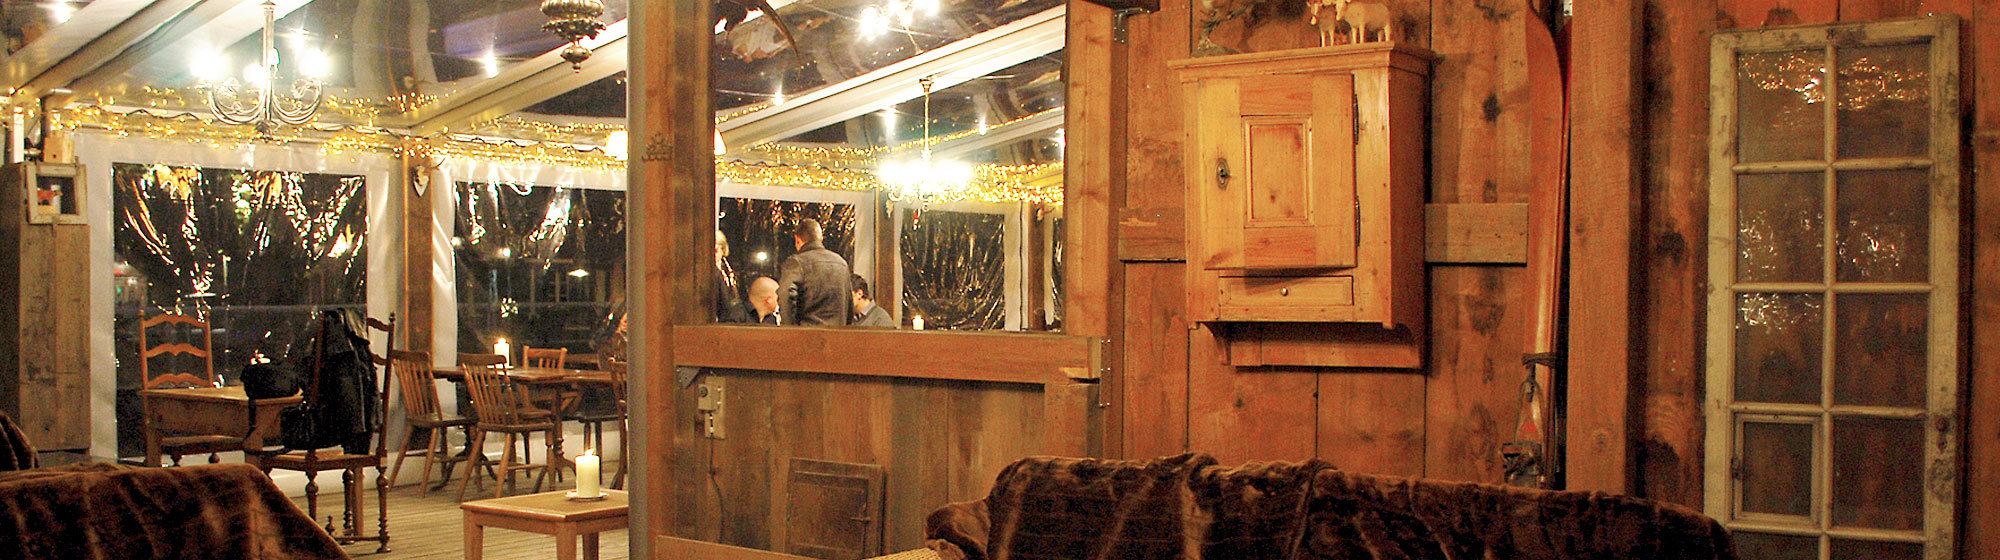 Schwellenmaetteli Restaurants • Bern